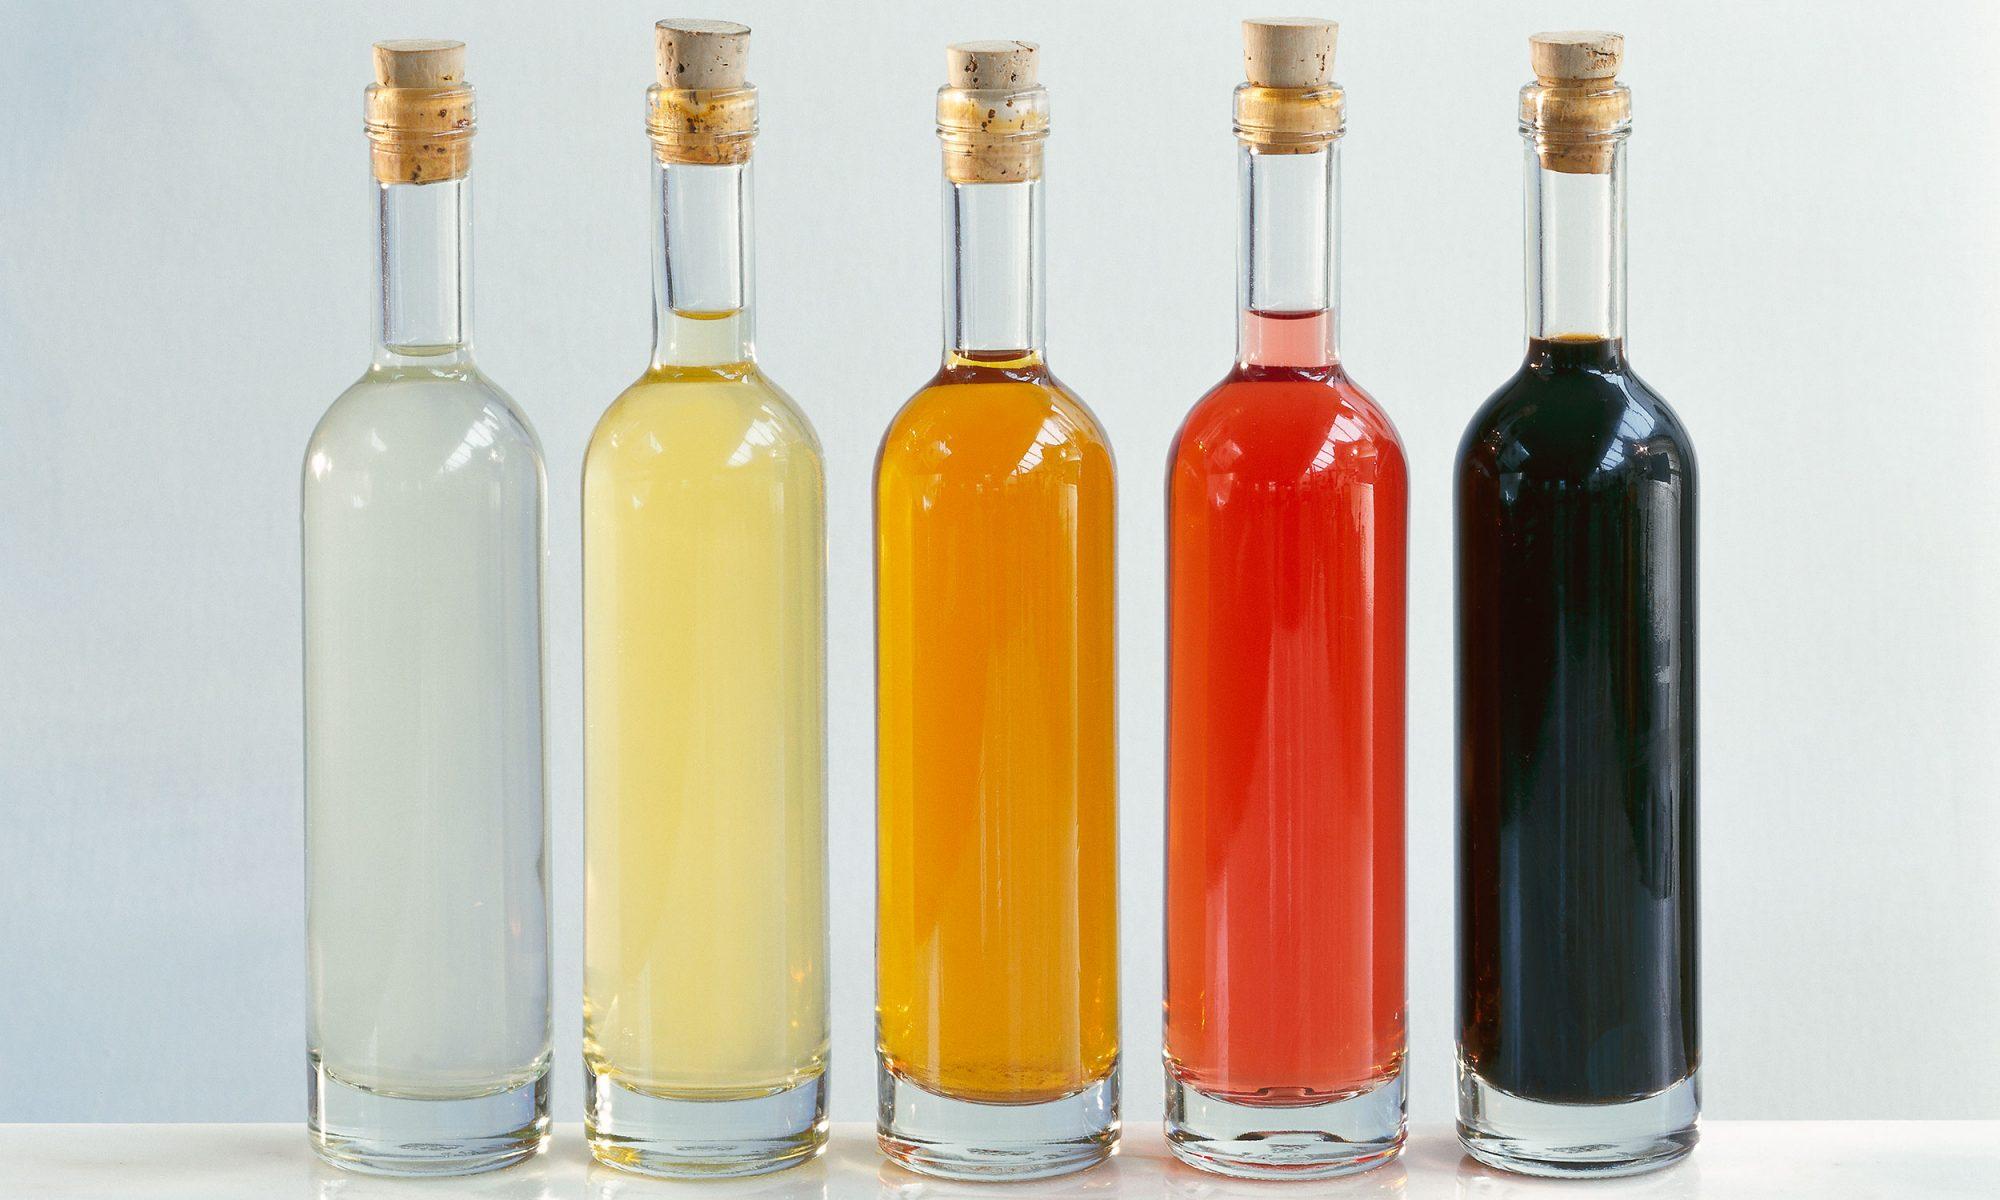 EC: Shrub Is the Most Refreshing way to Drink Vinegar